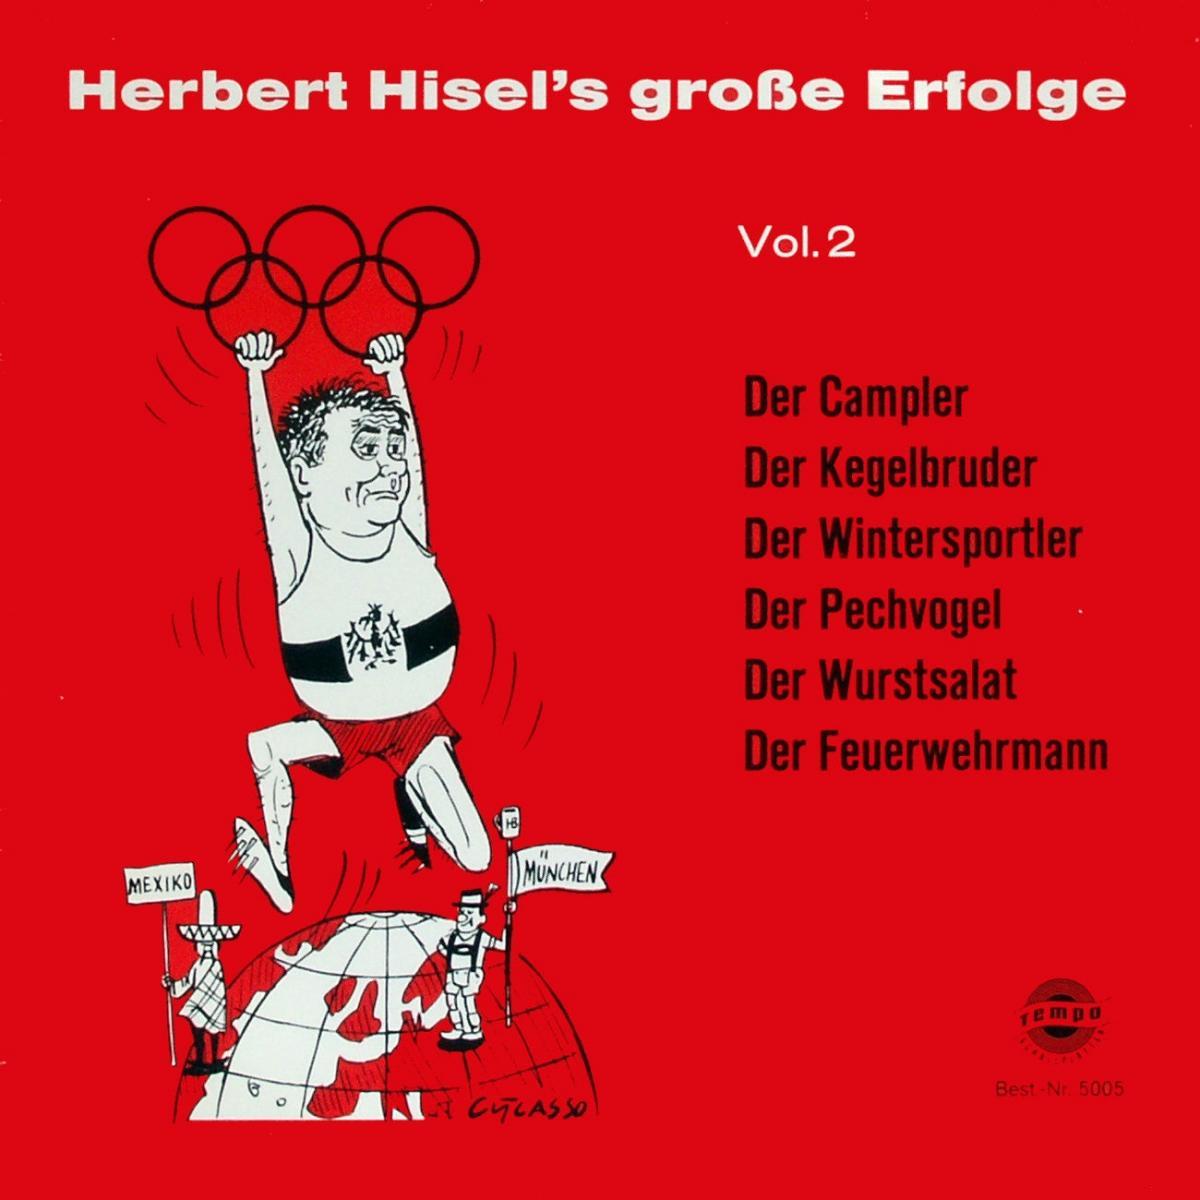 Hisel, Herbert - Herbert Hisel's Große Erfolge Vol. 2 [LP]